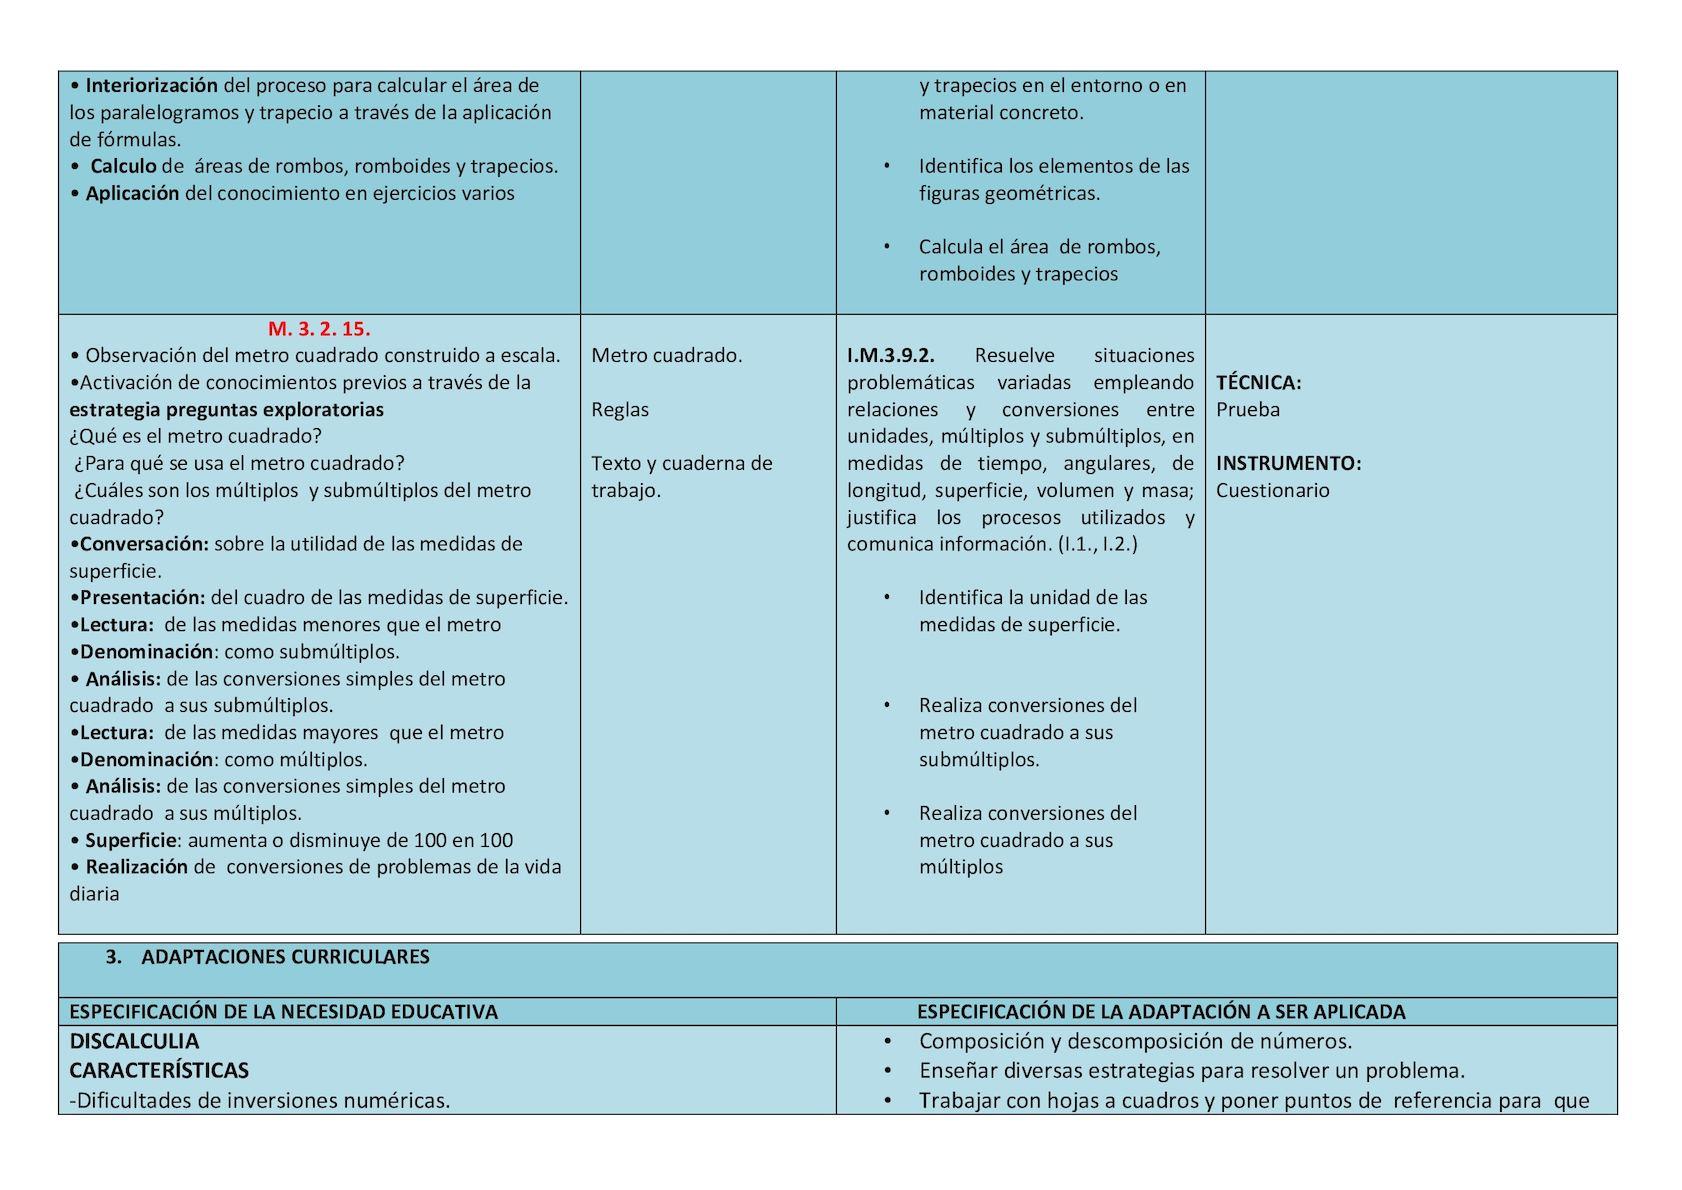 Pud Matematicas 6to Año - CALAMEO Downloader